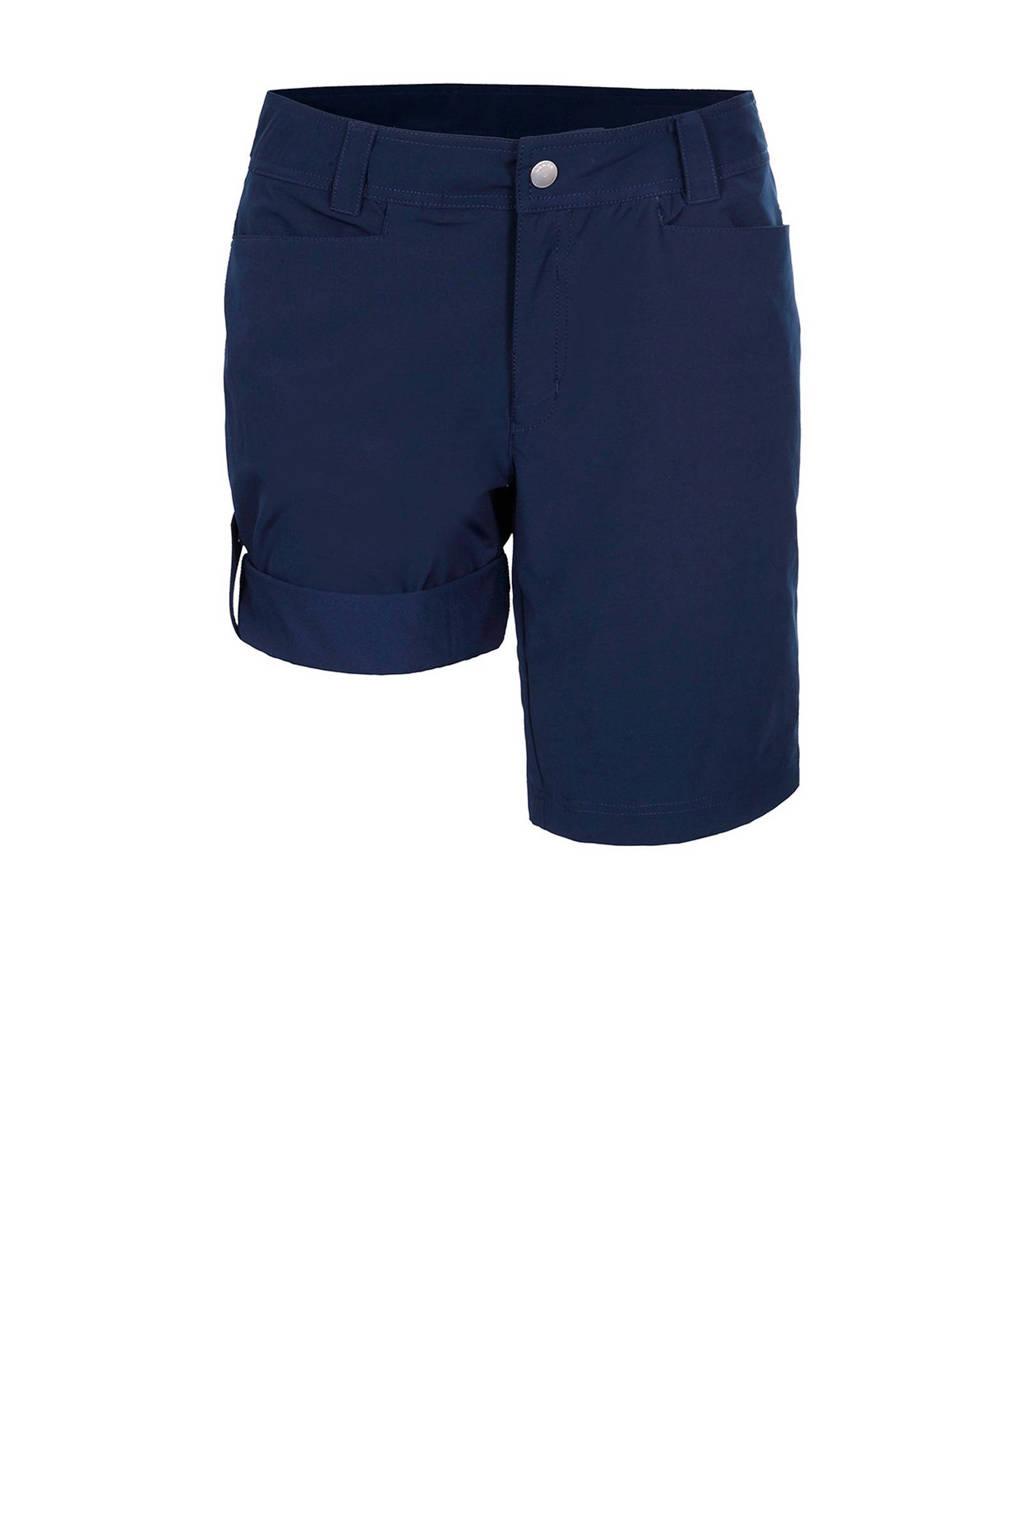 Luhta Piela outdoor short donkerblauw, Donkerblauw